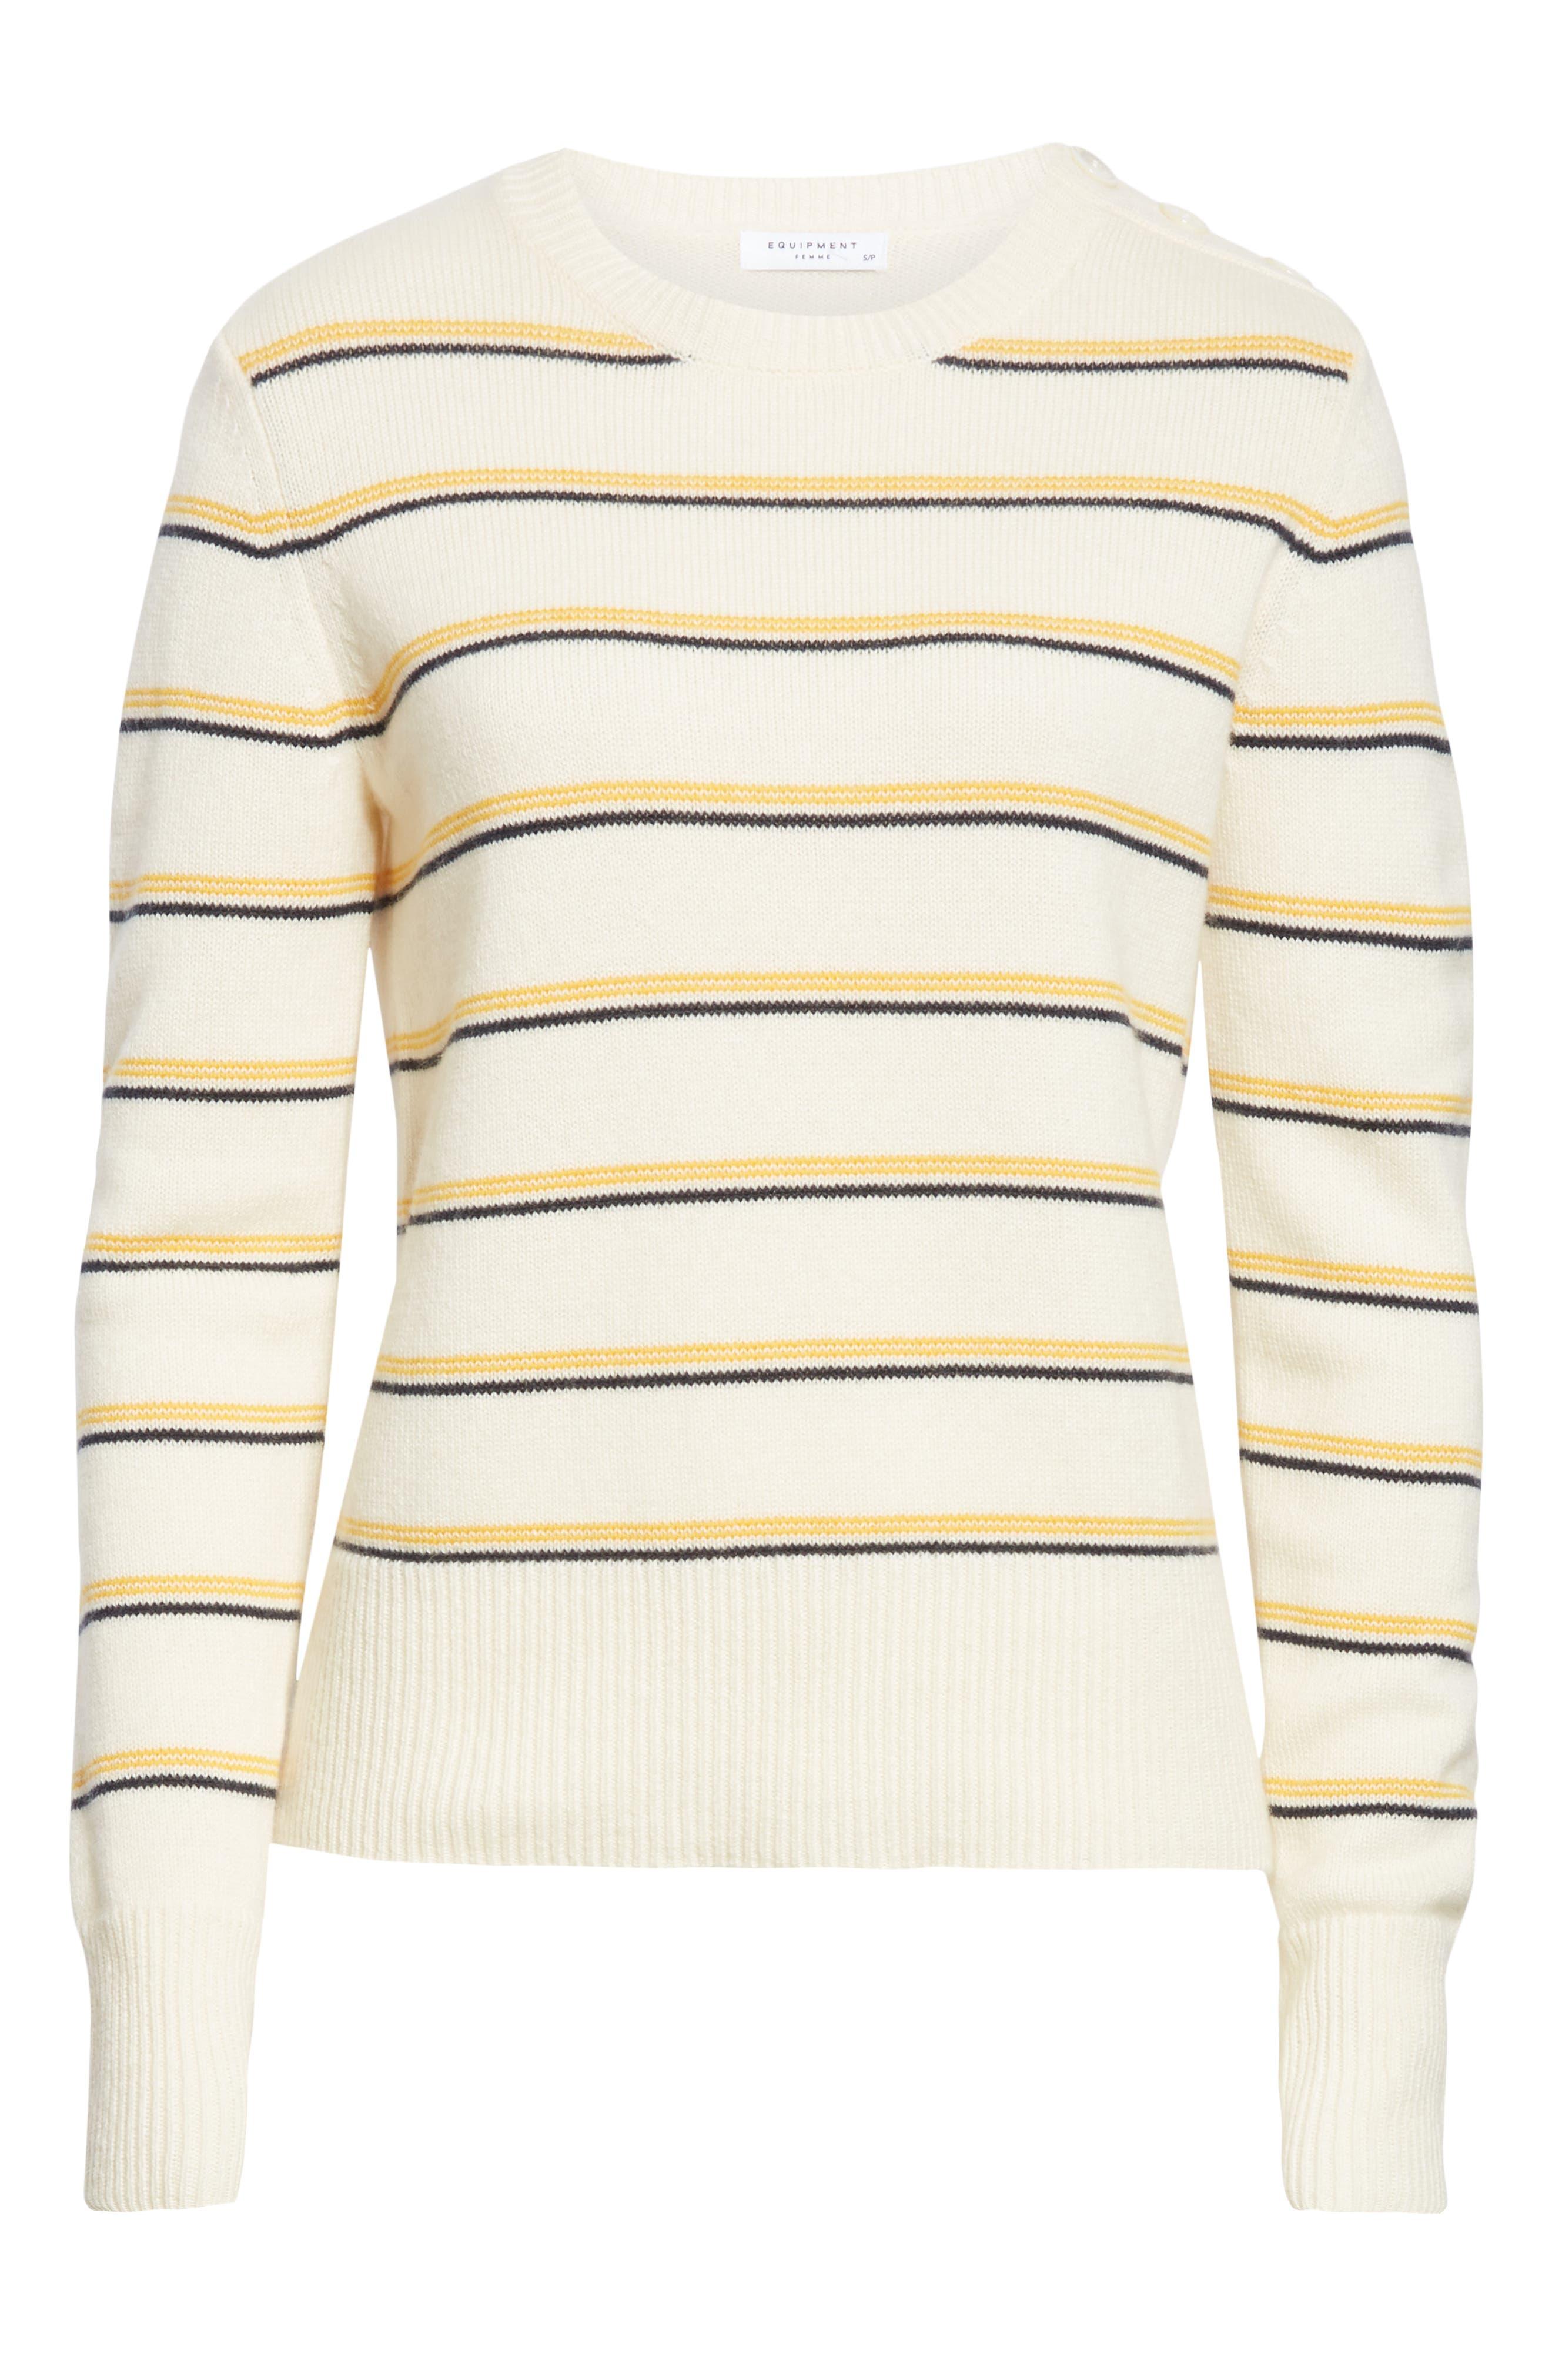 Duru Wool & Cashmere Sweater,                             Alternate thumbnail 6, color,                             NATURE WHITE MULTI